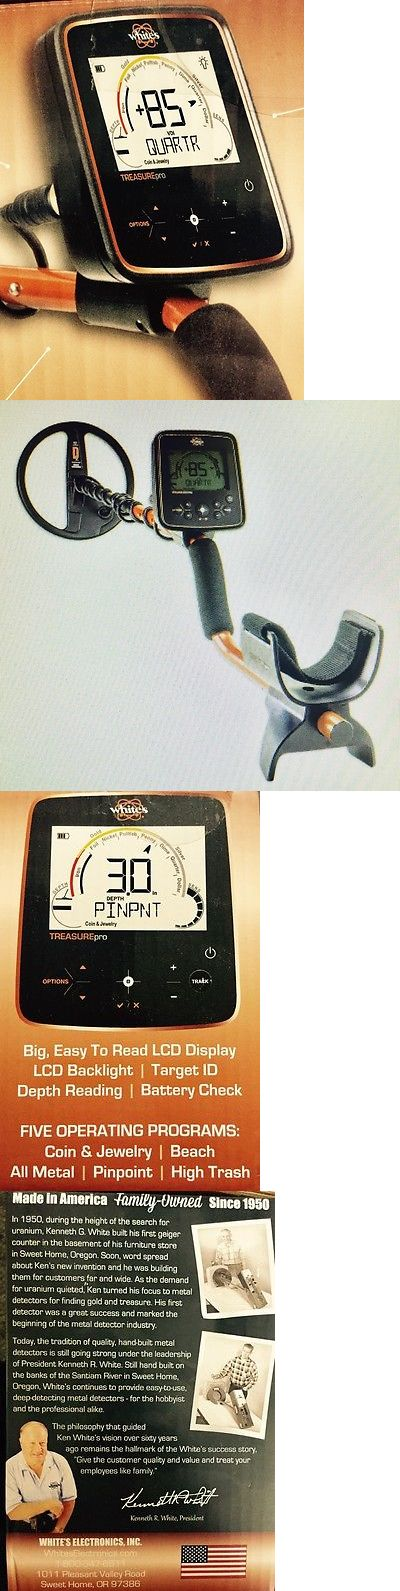 Metal Detectors: Whites Treasurepro Metal Detector, Waterproof 10 Dd Coil, Backlight, 8 Tones! BUY IT NOW ONLY: $369.99